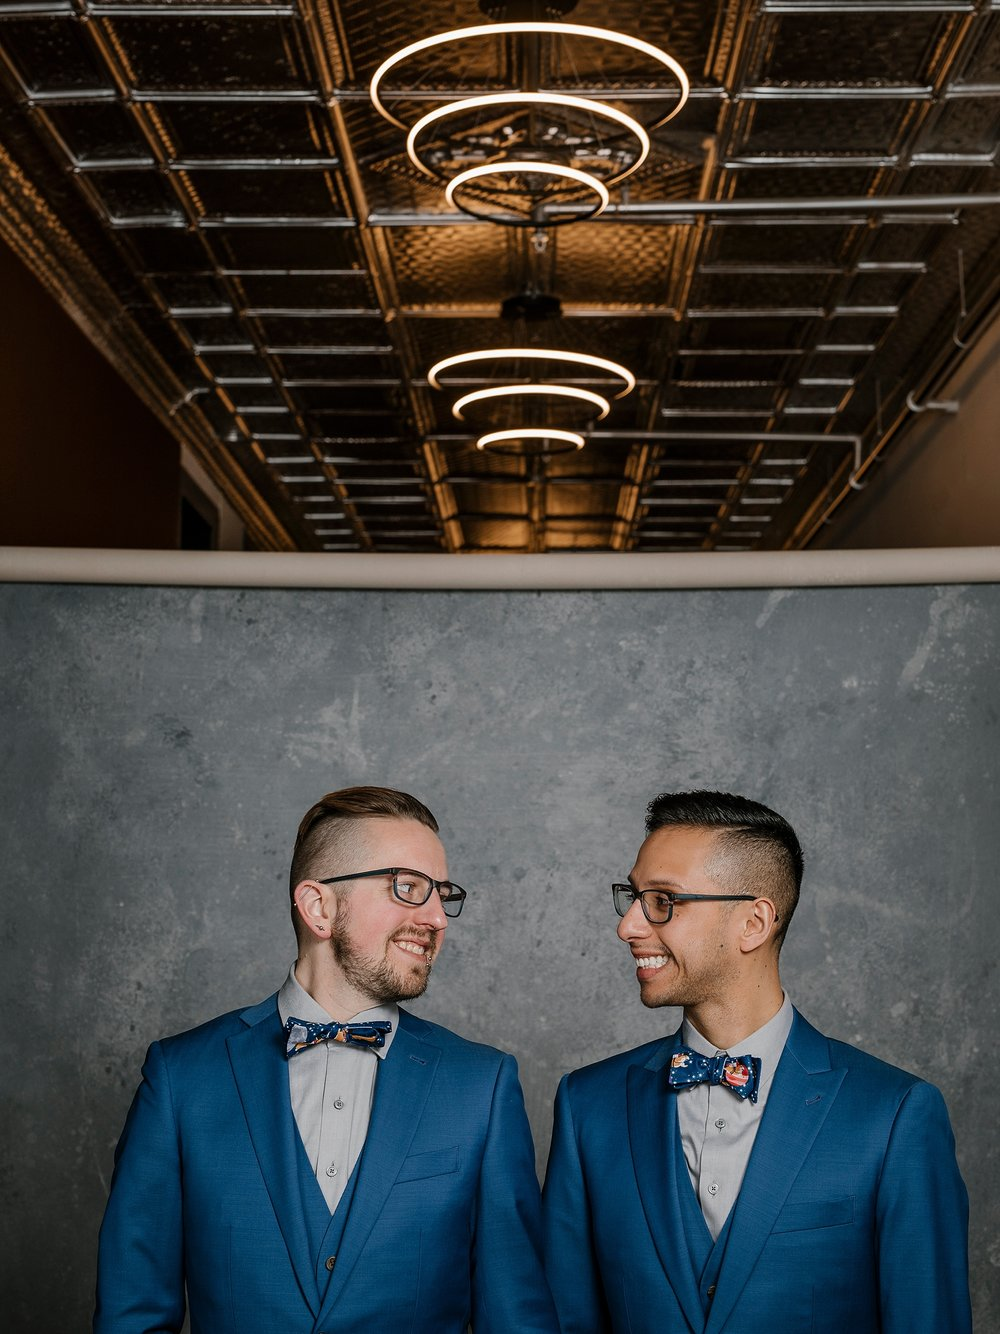 Joe_Mac_Creative_Philadelphia_Philly_LGBT_Gay_Engagement_Wedding_Photography__0089.jpg